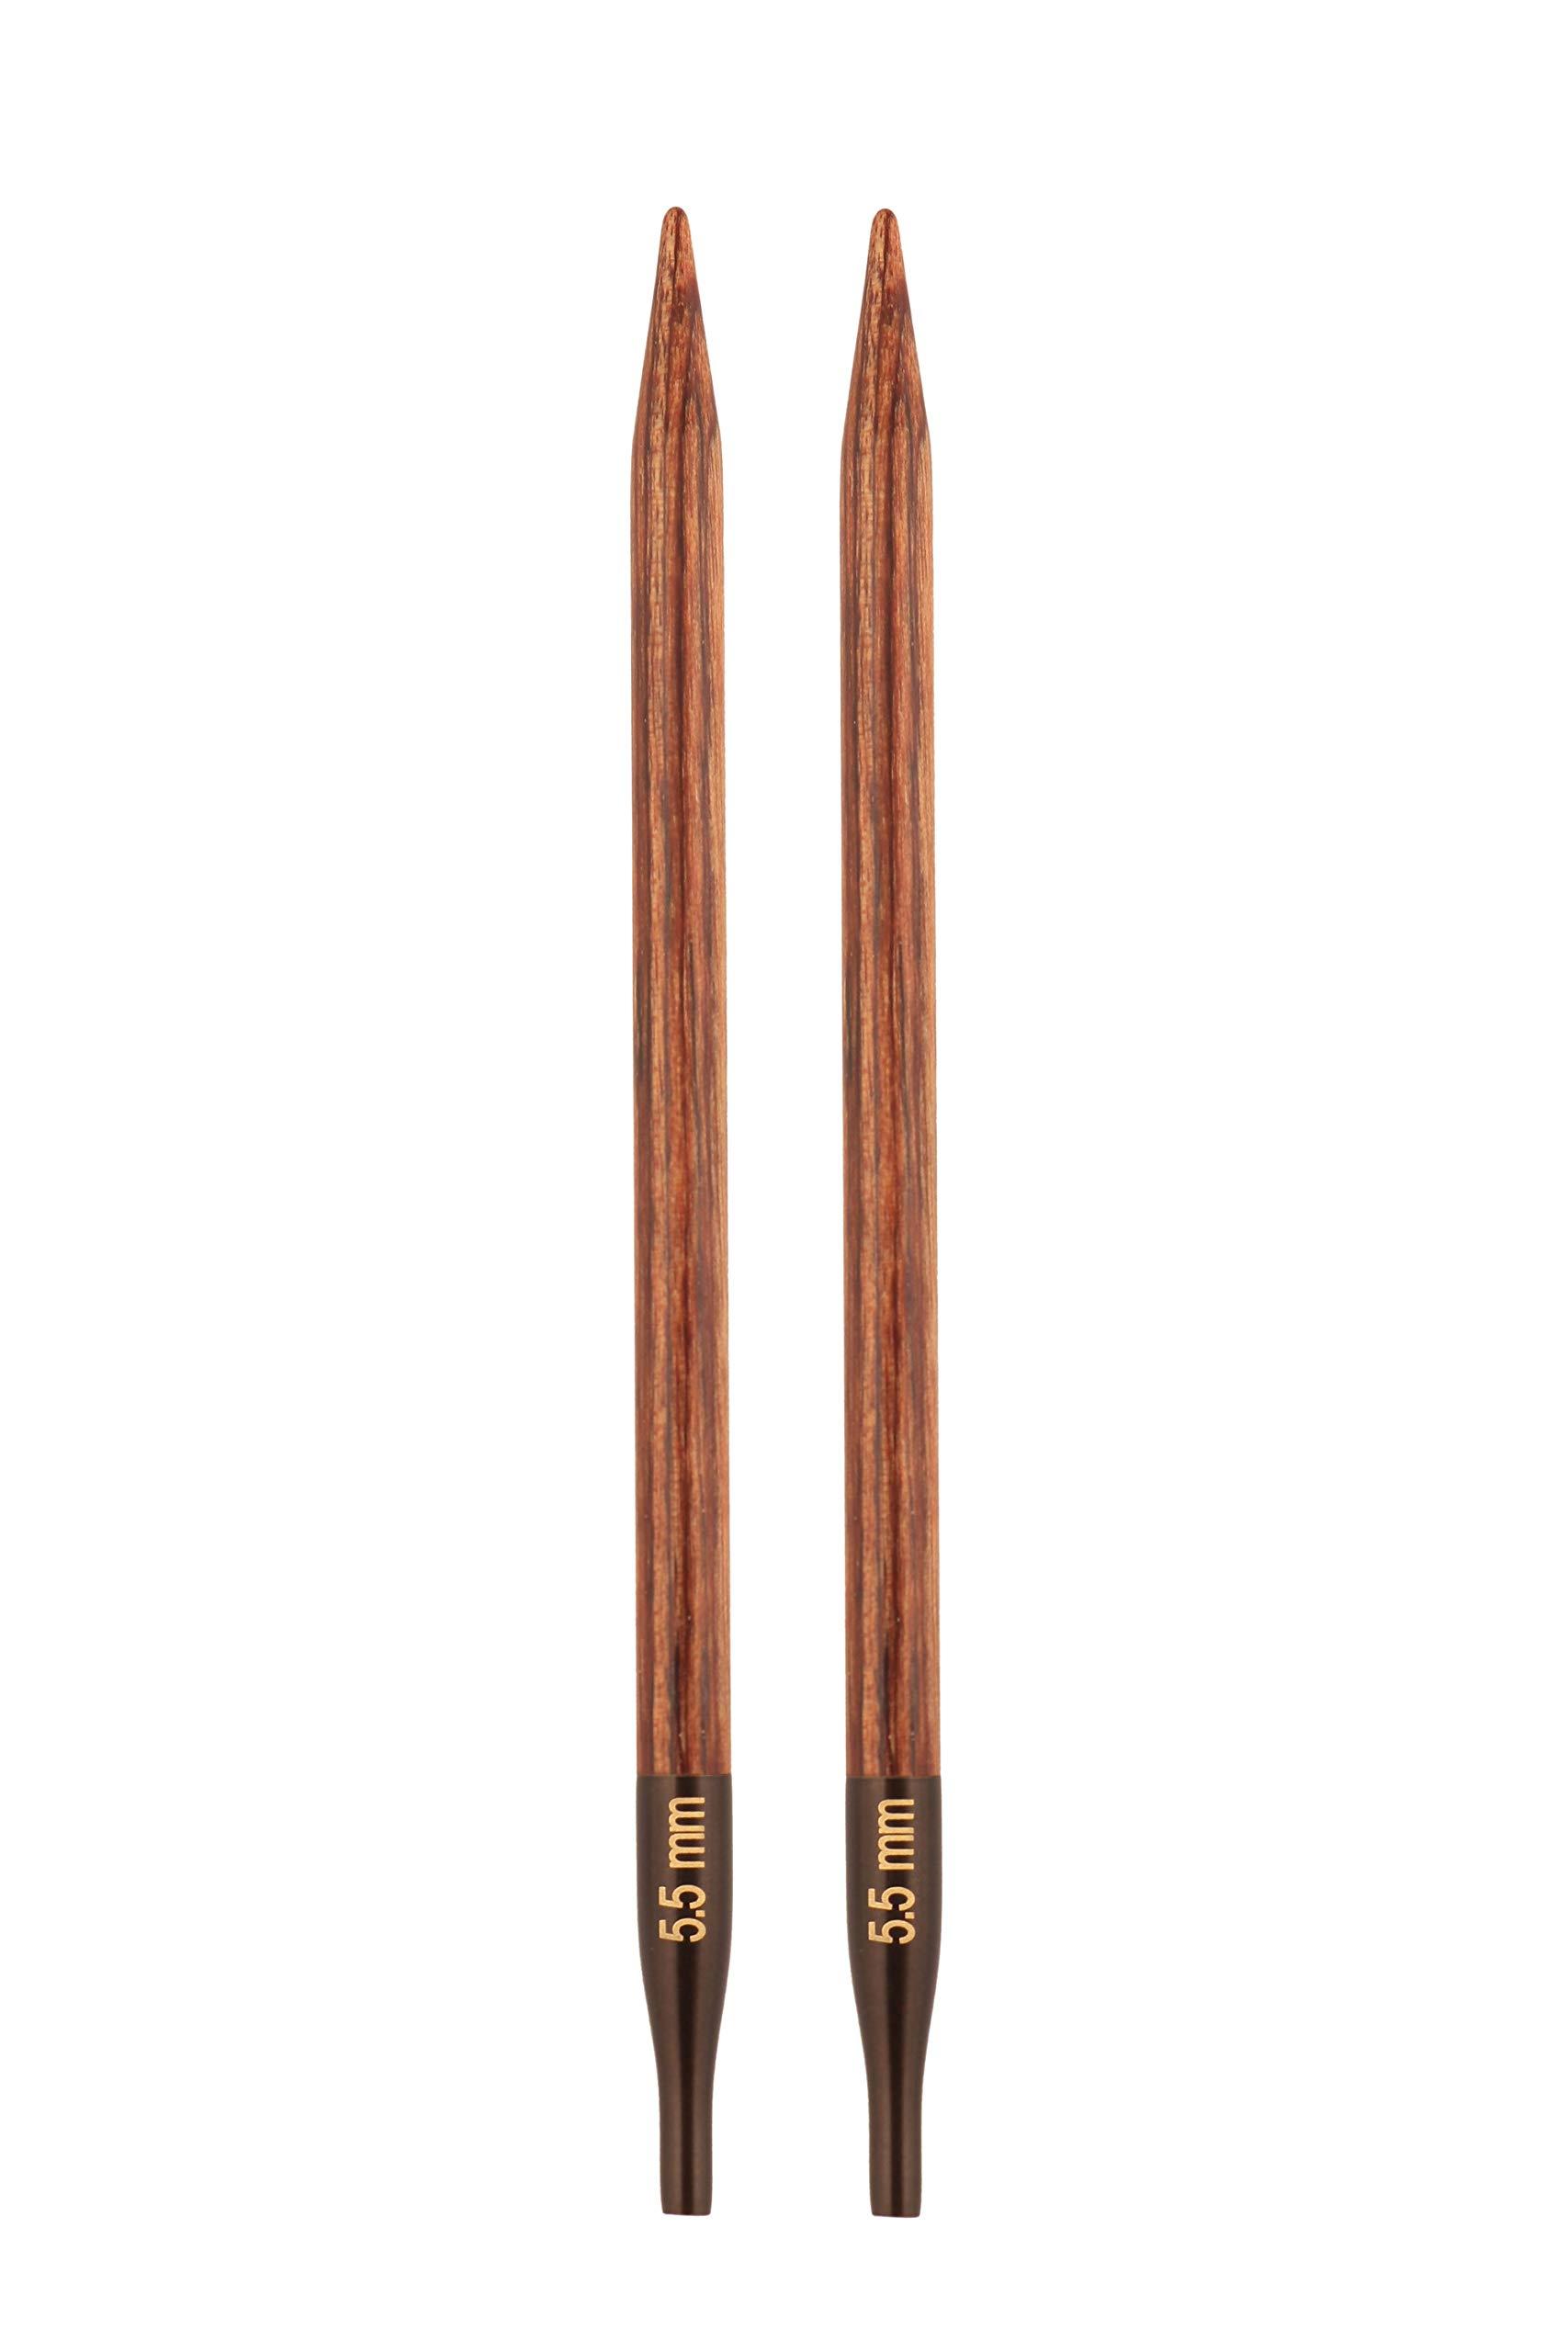 KnitPro KP20414 Symfonie Interchangeable Circular Knitting Needle 15mm 2pk